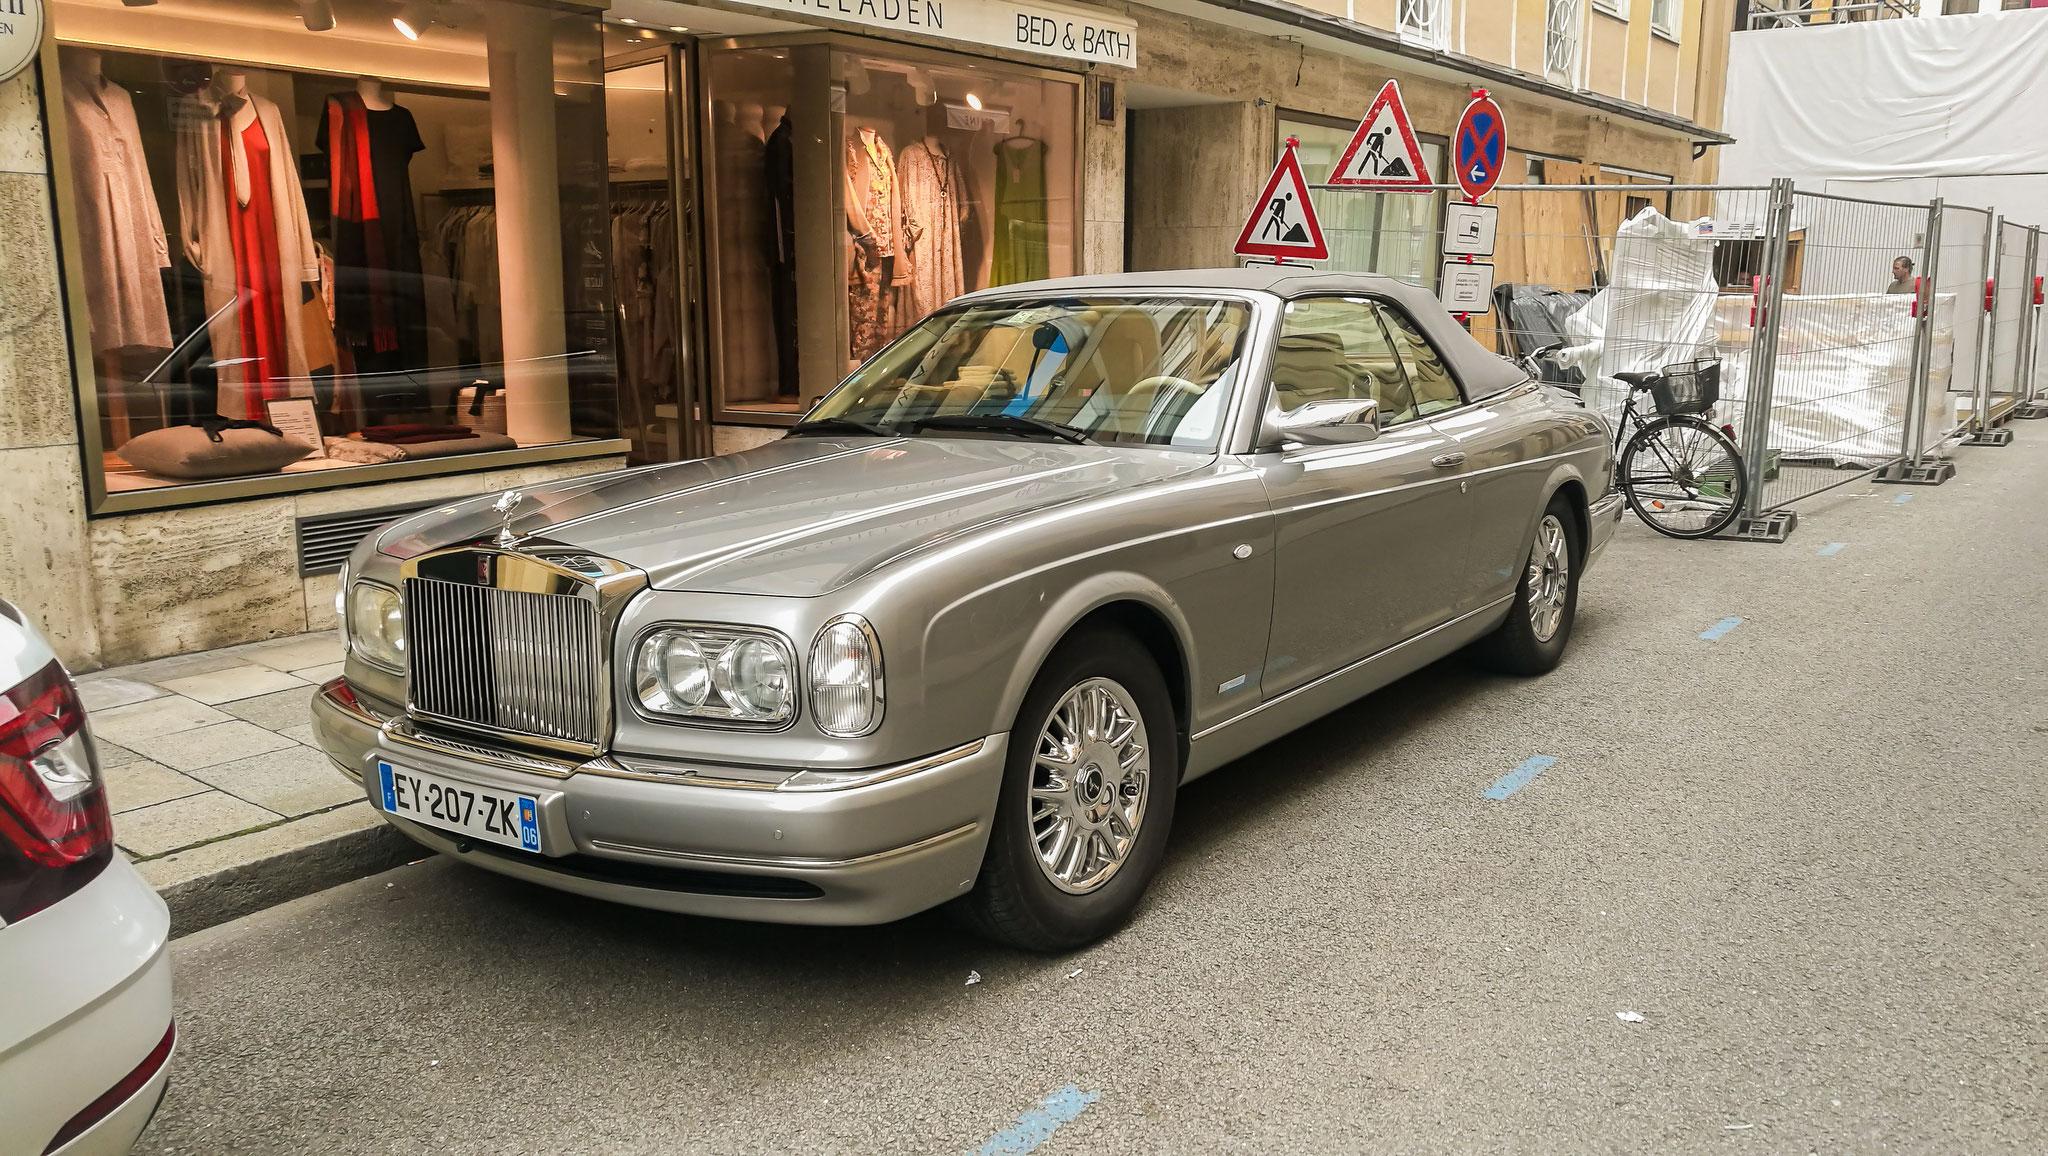 Rolls Royce Corniche V - EY-207-ZK_06 (FRA)